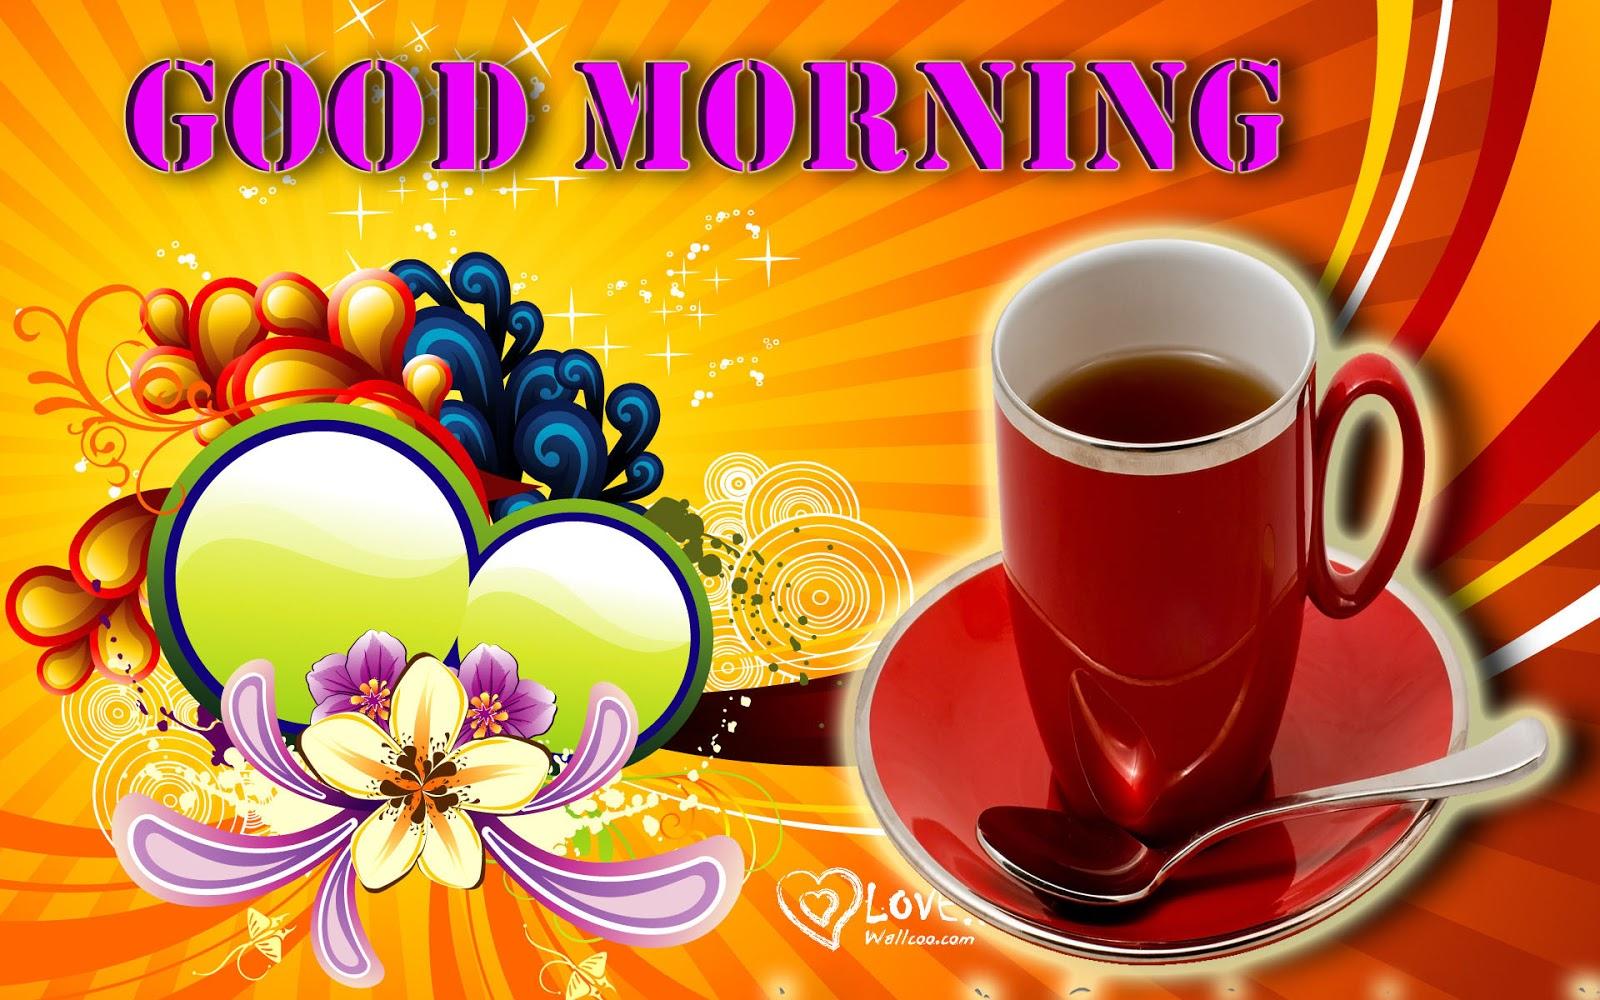 Happy Good Morning HD Wallpaper Free